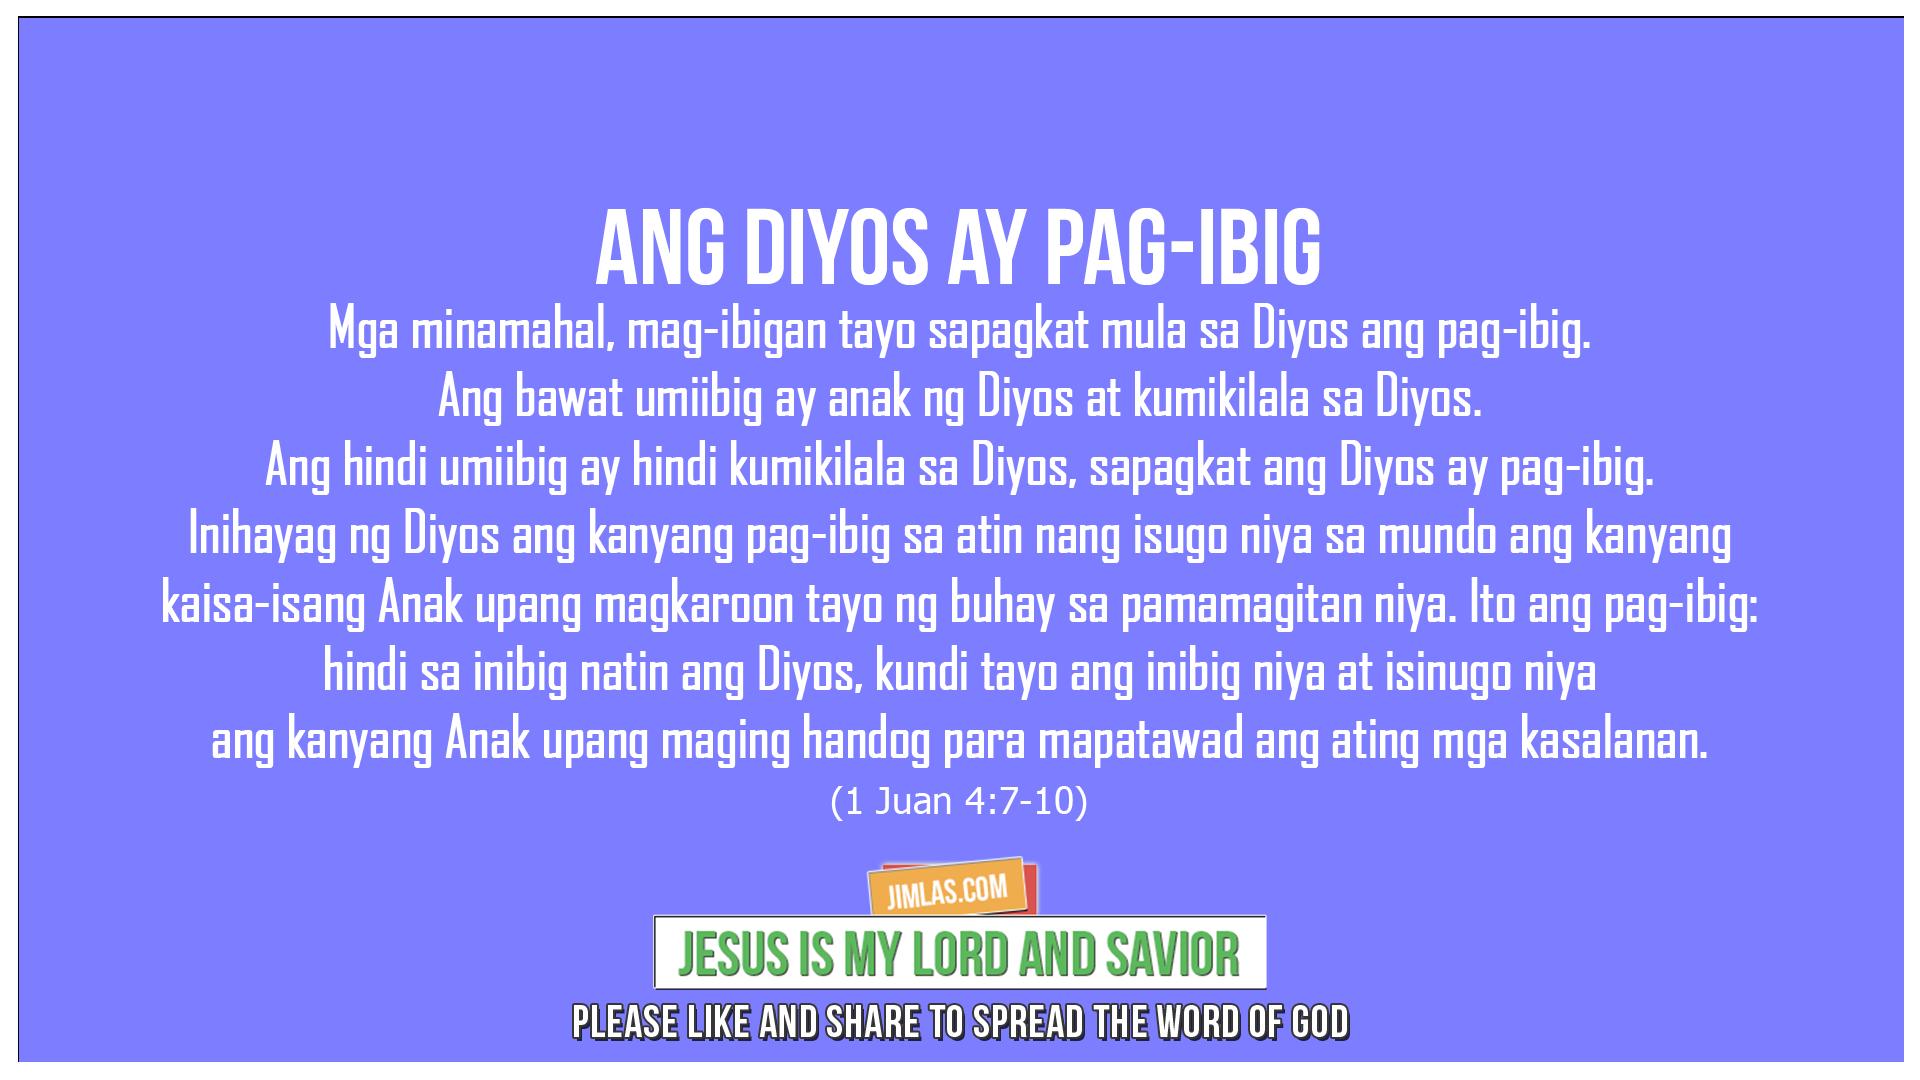 1 Juan 4:7-10, 1 Juan 4:7-10